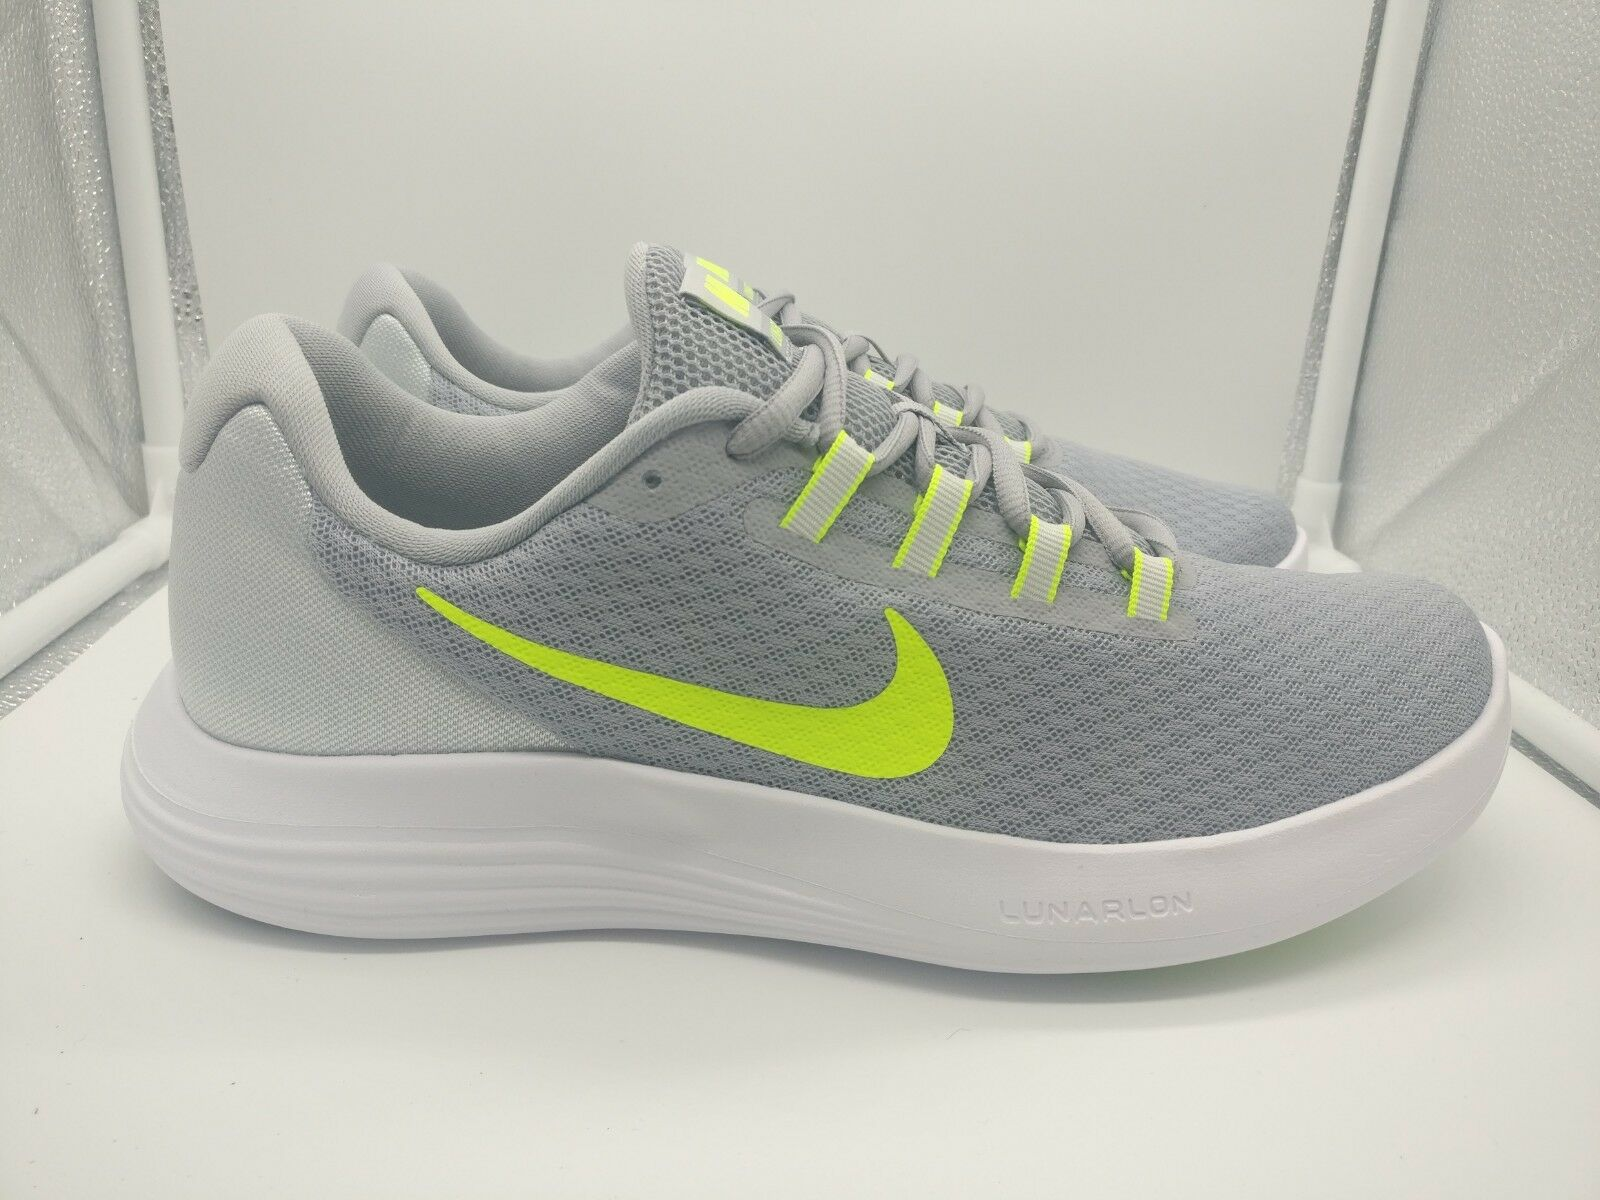 Nike damen Lunarconverge UK 8.5 Wolf grau Volt Pure Platinum Weiß 852469-003